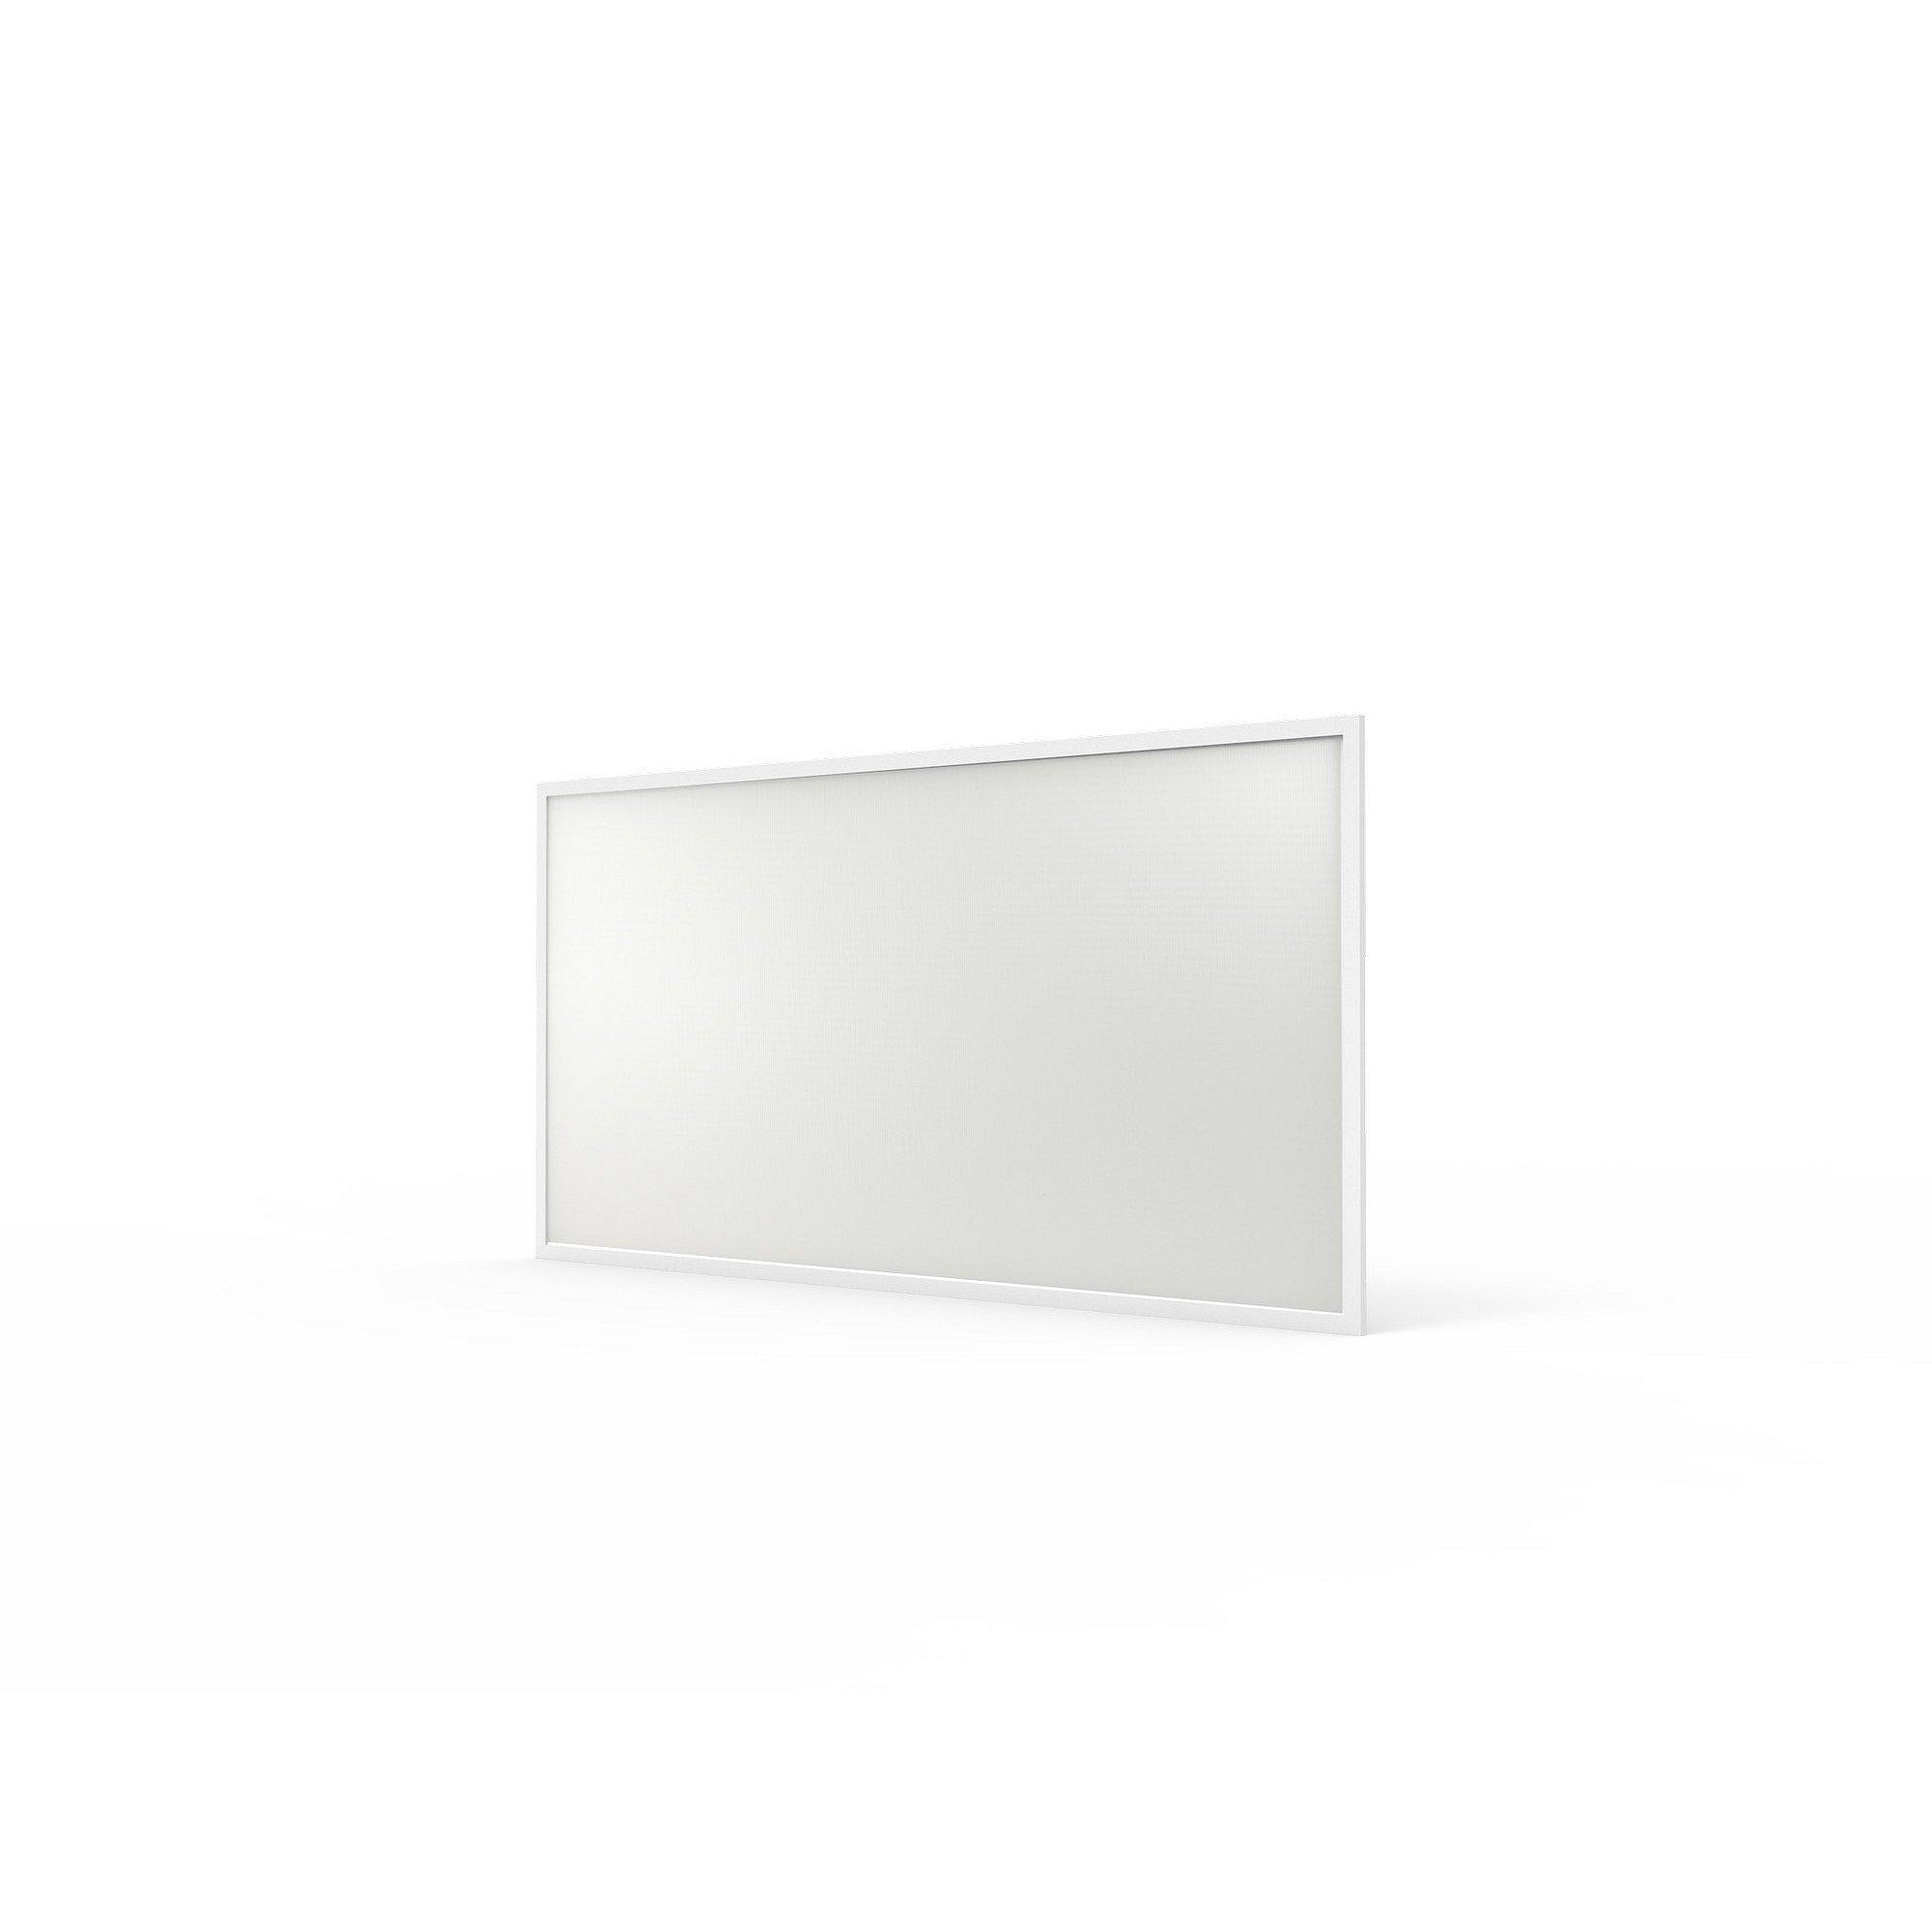 Panel LED Thome Lighting, 60 W, 6600 lm, IP 44